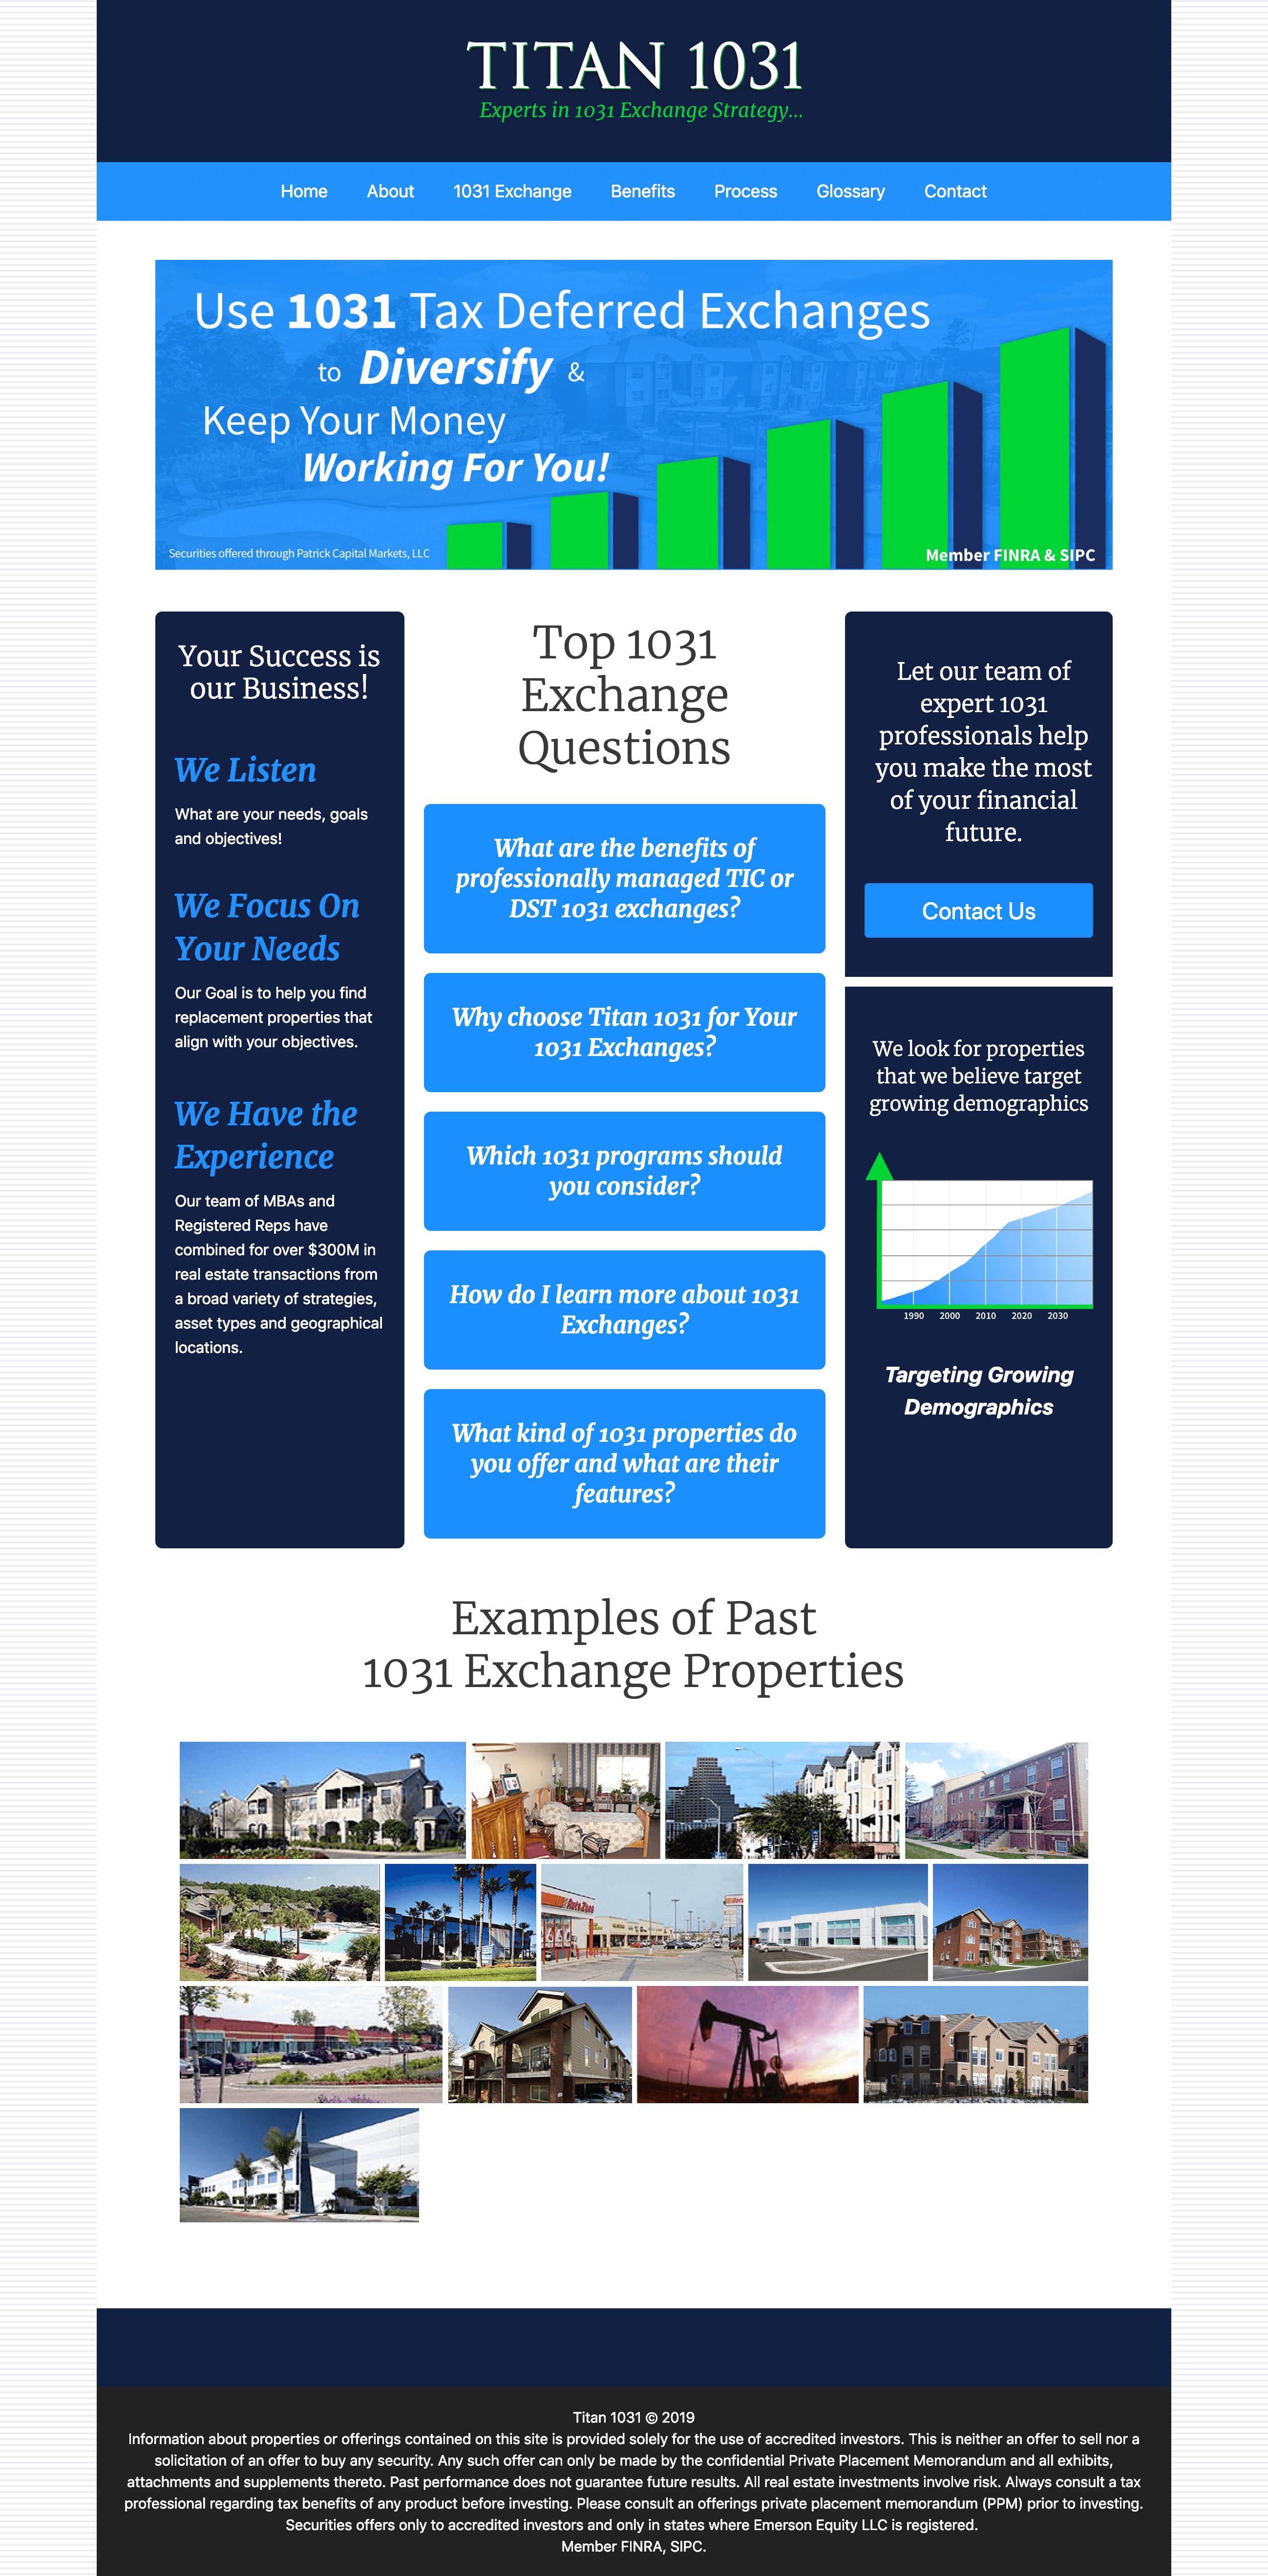 Titan-1031-Real-Estate-Exchange-Website-Design-Home-Page